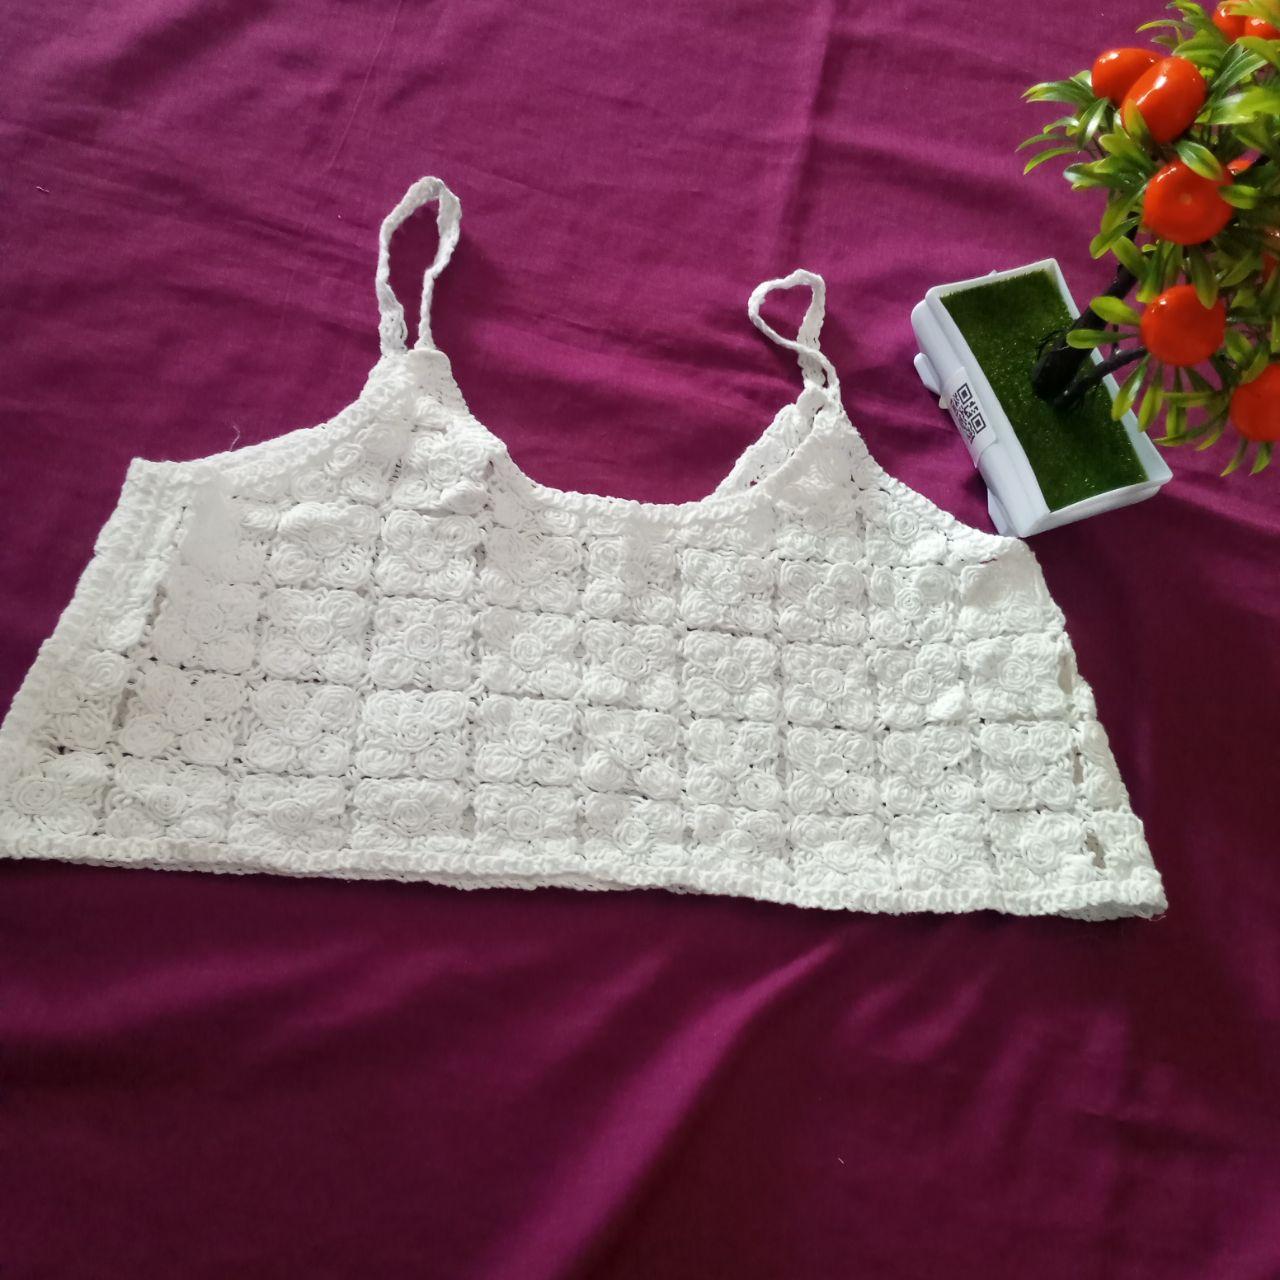 ini adalah Vest Bordir Gilda Putih, size: L, material: wool, color: White, brand: veststyleindonesia, age_group: all ages, gender: female